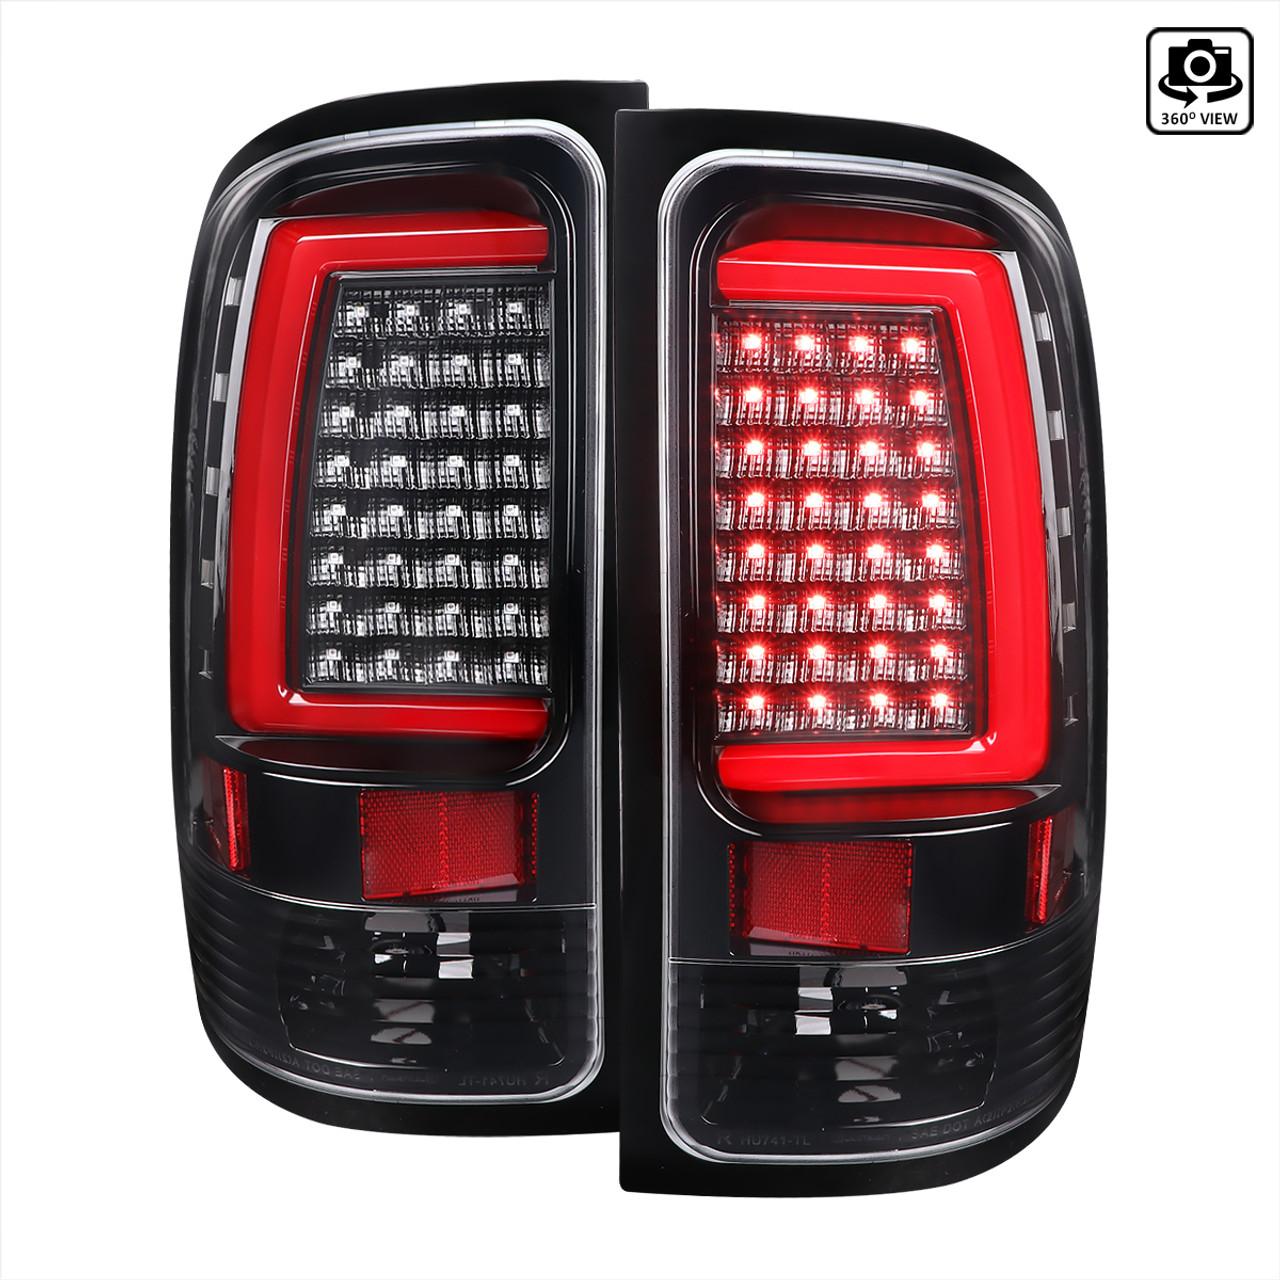 For 2007-2013 GMC Sierra 2500HD 3500HD Chrome Housing Clear Lens LED Tail Lights